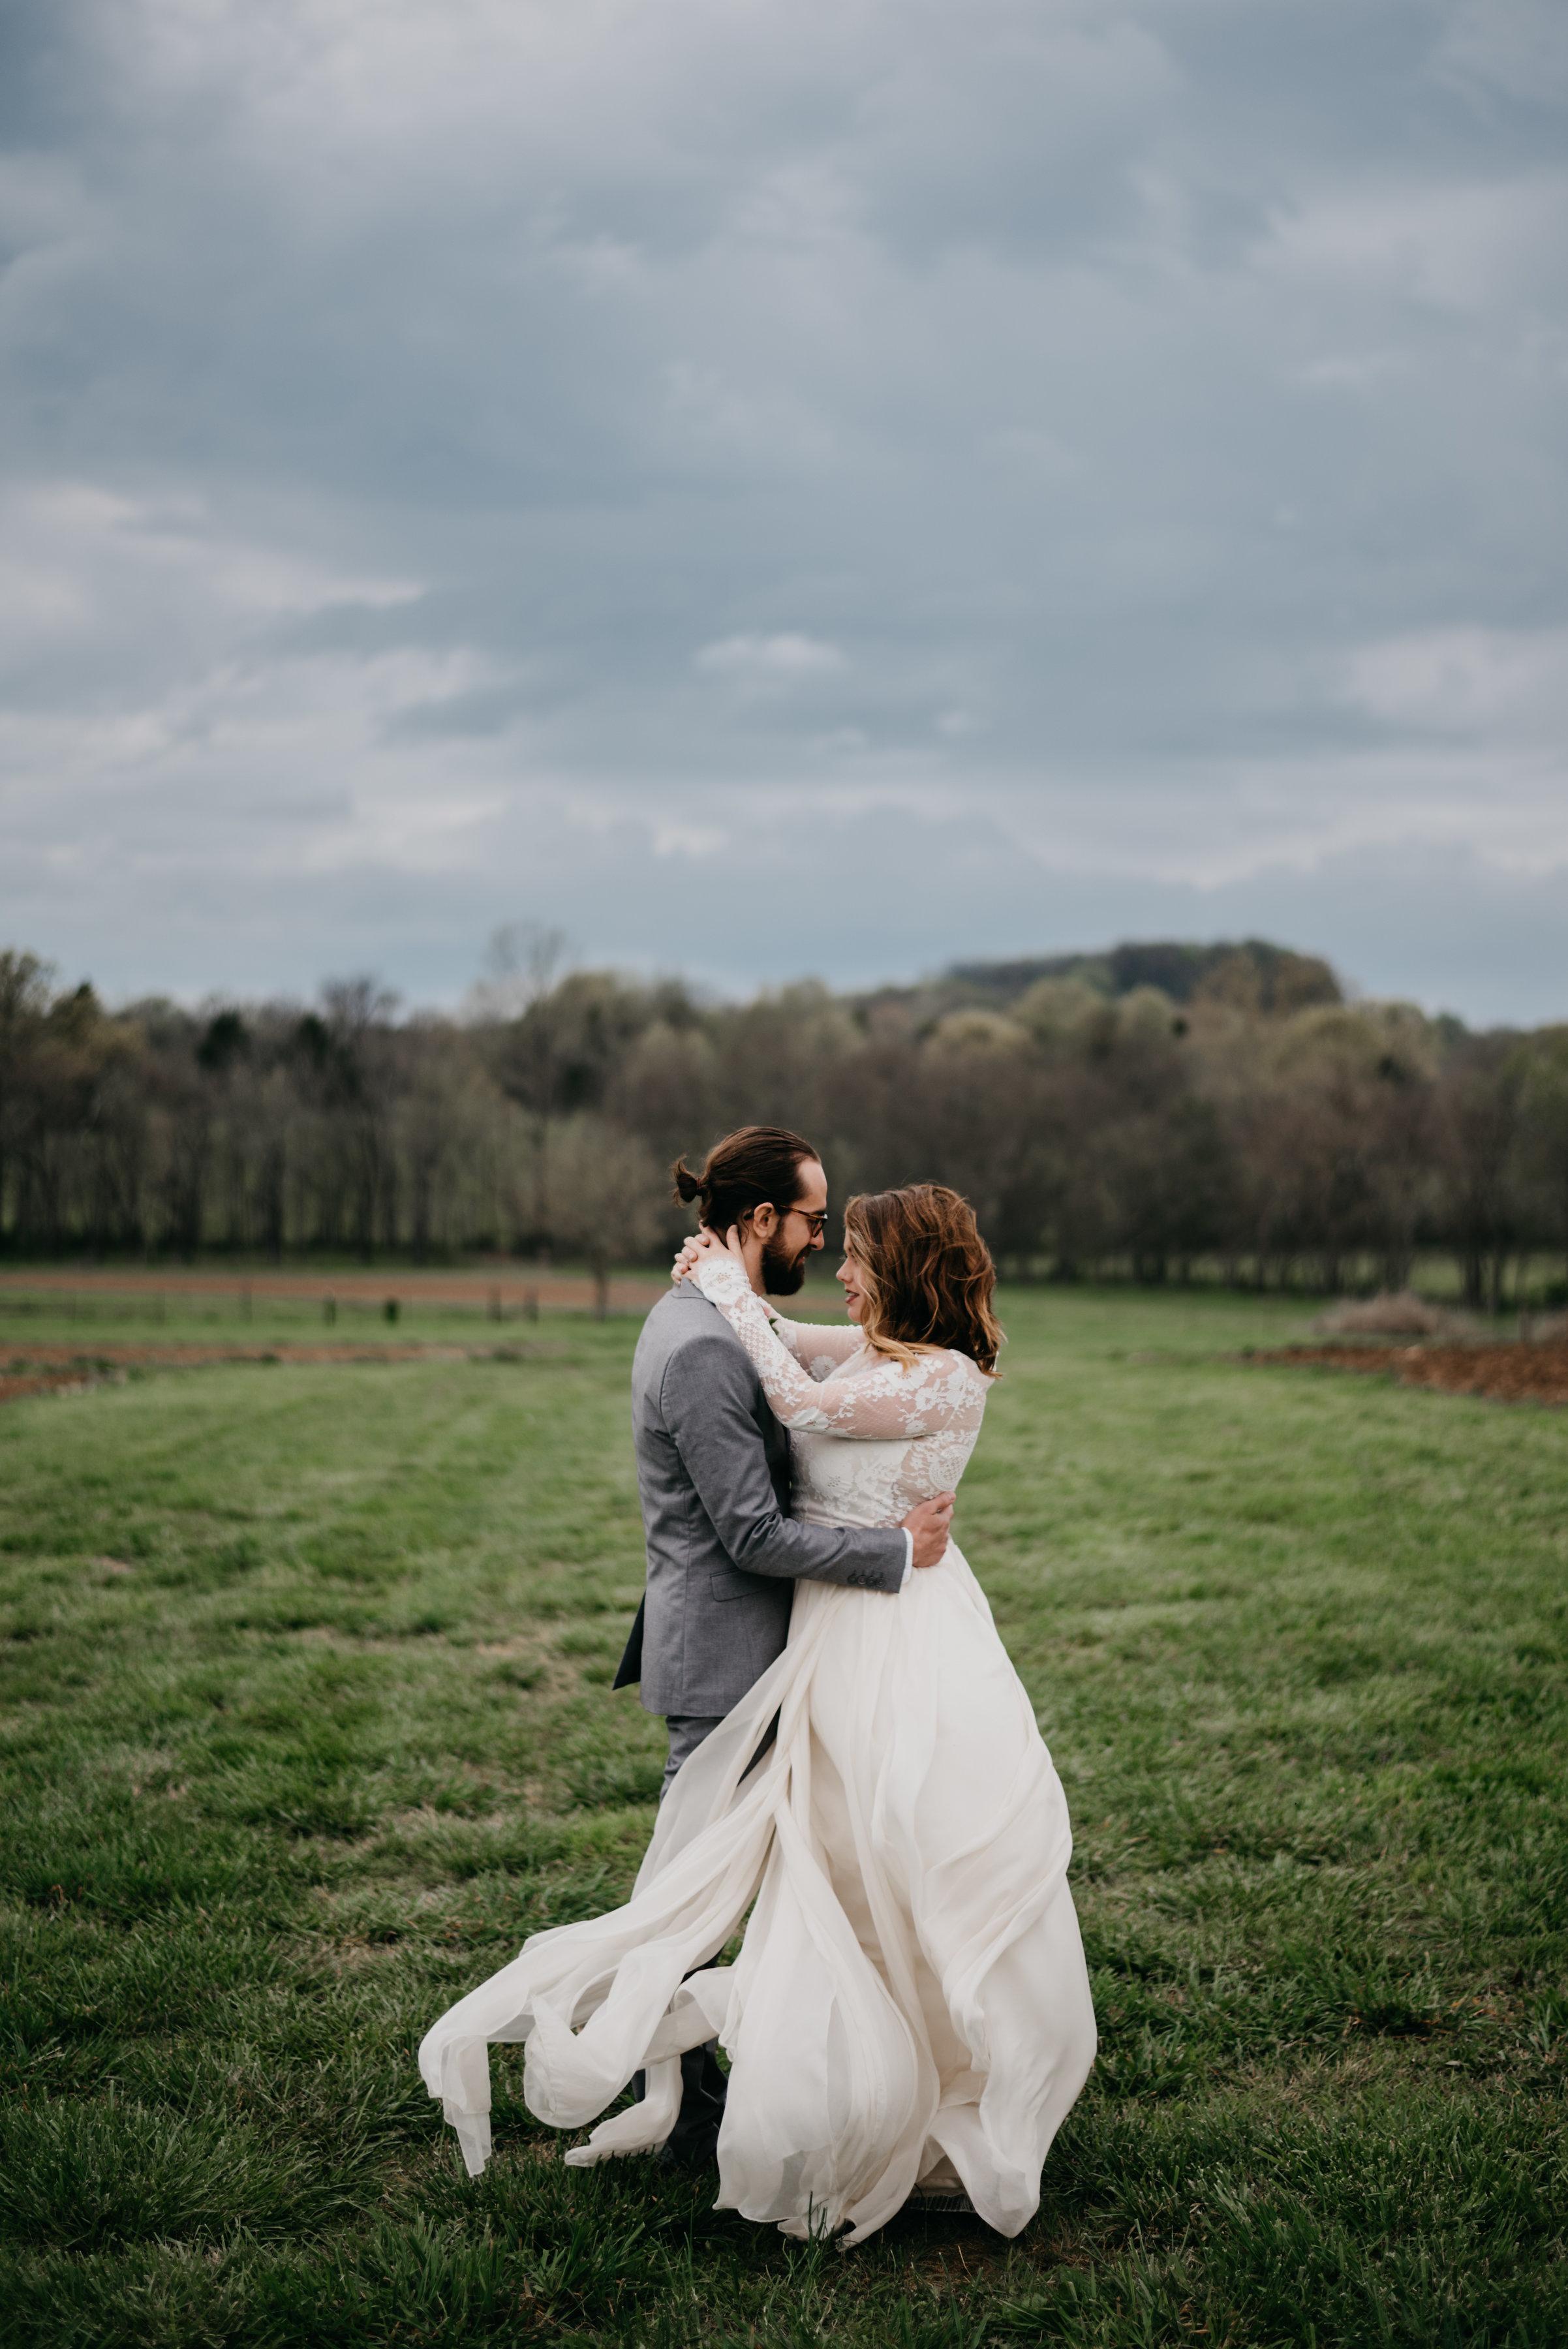 Allenbrooke-Farms-Nashville-Wedding-Photographers 33.jpg